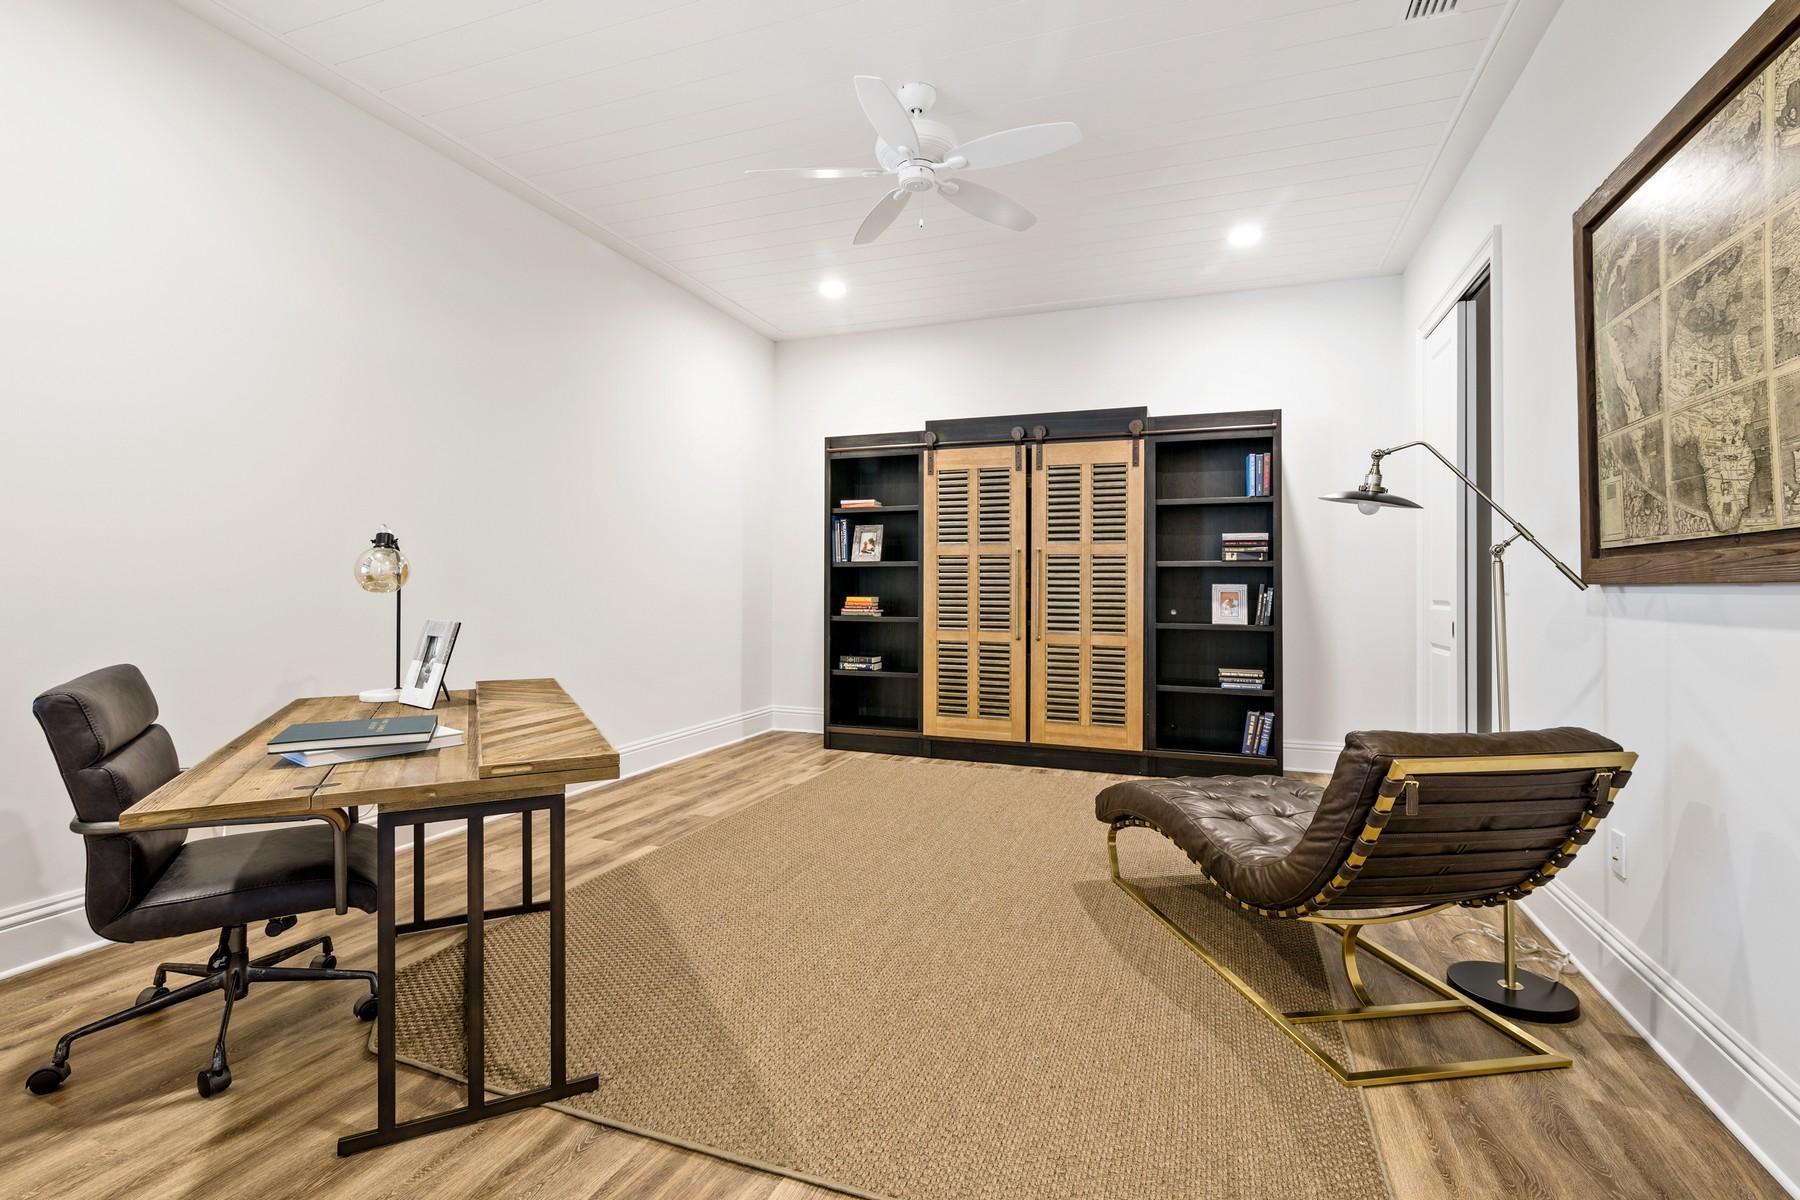 Additional photo for property listing at Luxury New Home in the Reserve at Grand Harbor 2348 Grand Harbor Reserve Square Vero Beach, Florida 32967 Amerika Birleşik Devletleri